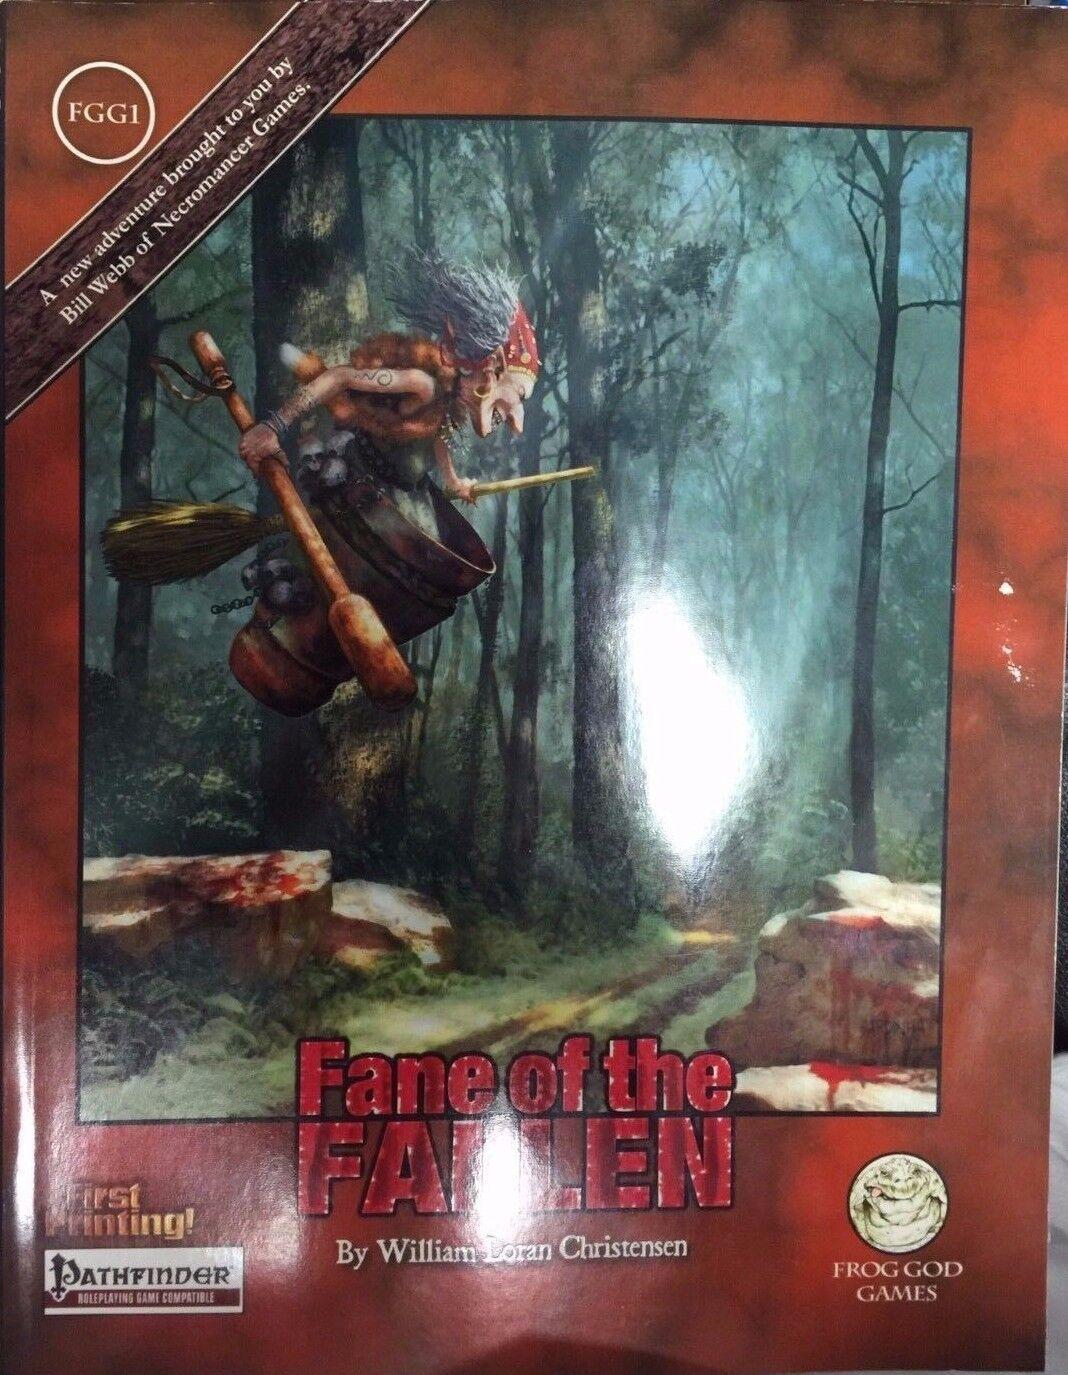 Pathfinder RPG module - Fane of the Fallen FGG1